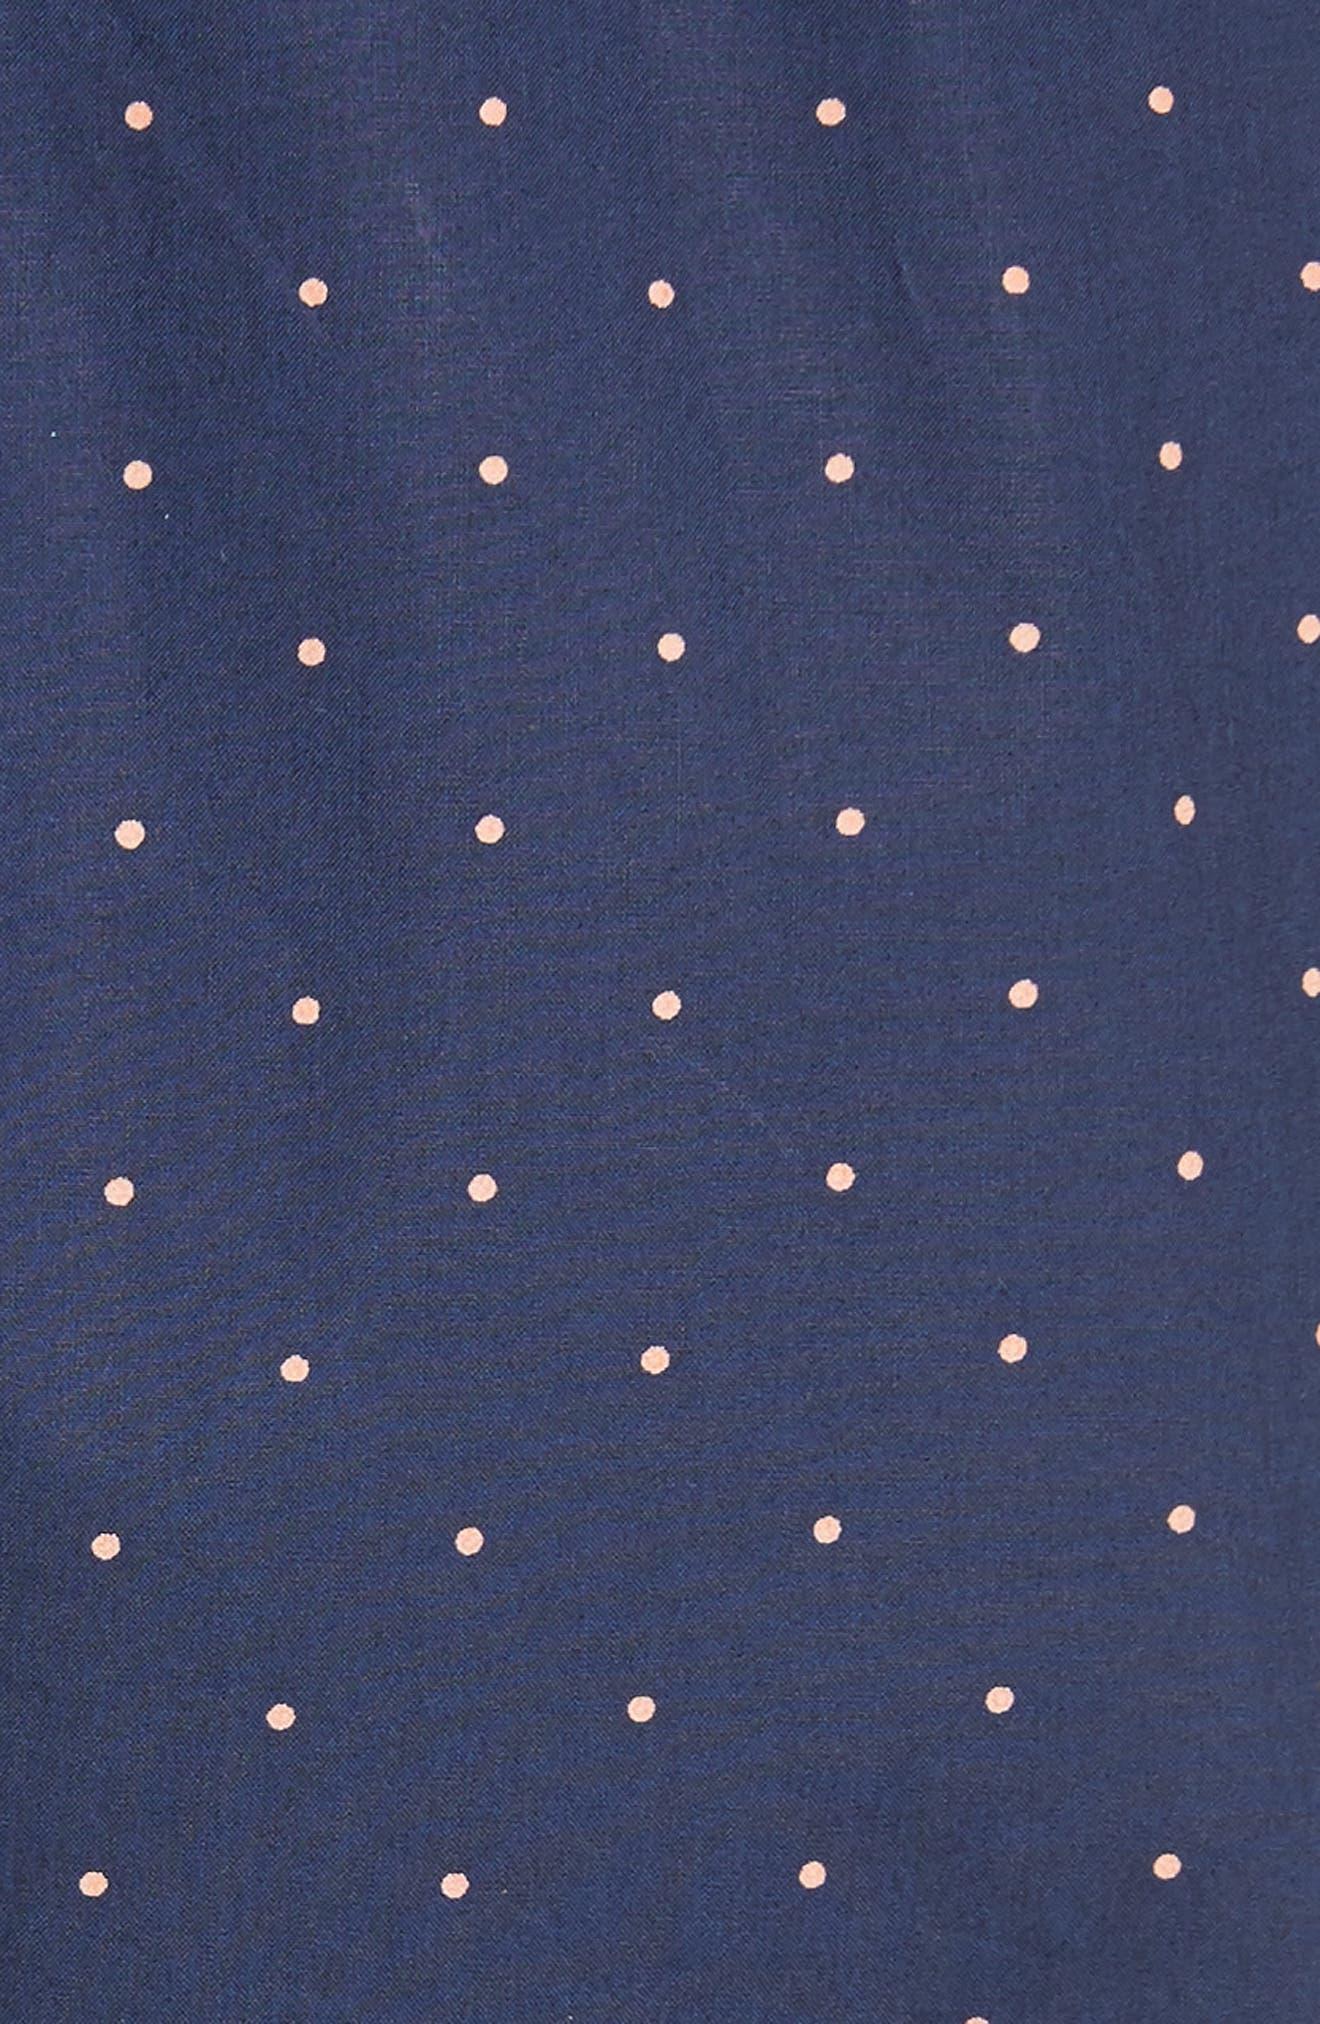 Malachy Ruffle Dot Cotton Dress,                             Alternate thumbnail 5, color,